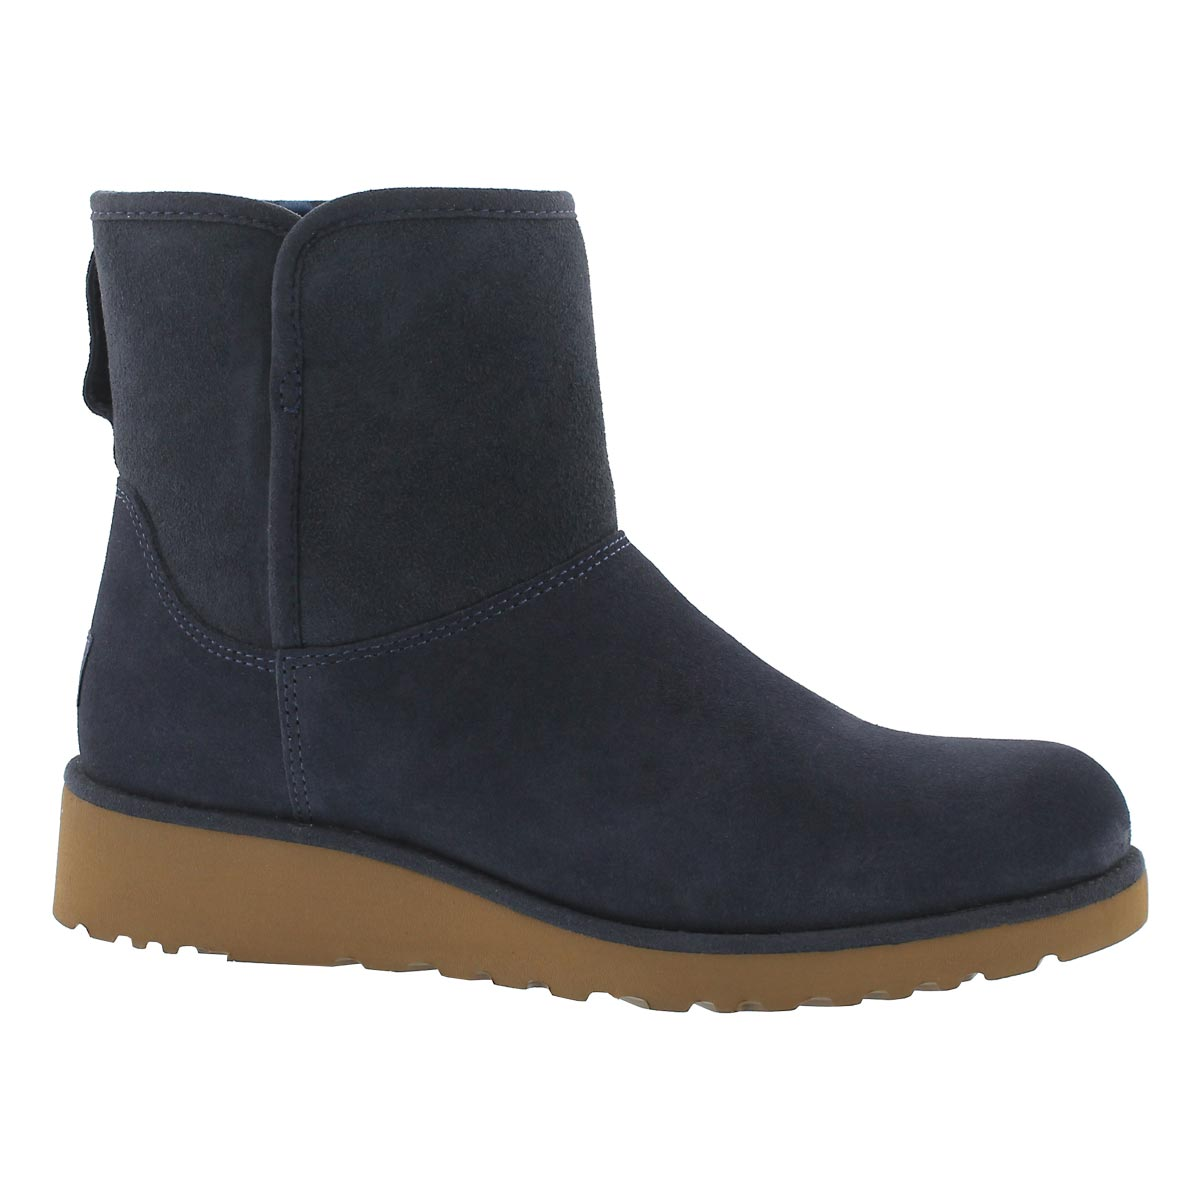 Women's KRISTIN navy wedge sheepskin boots